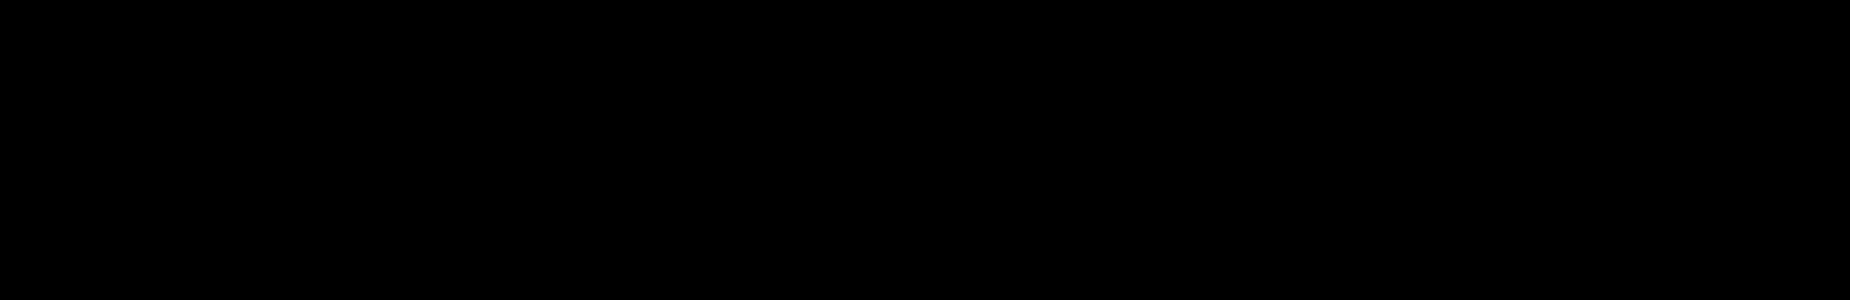 Sodium Hypochlorite Pentahydrate